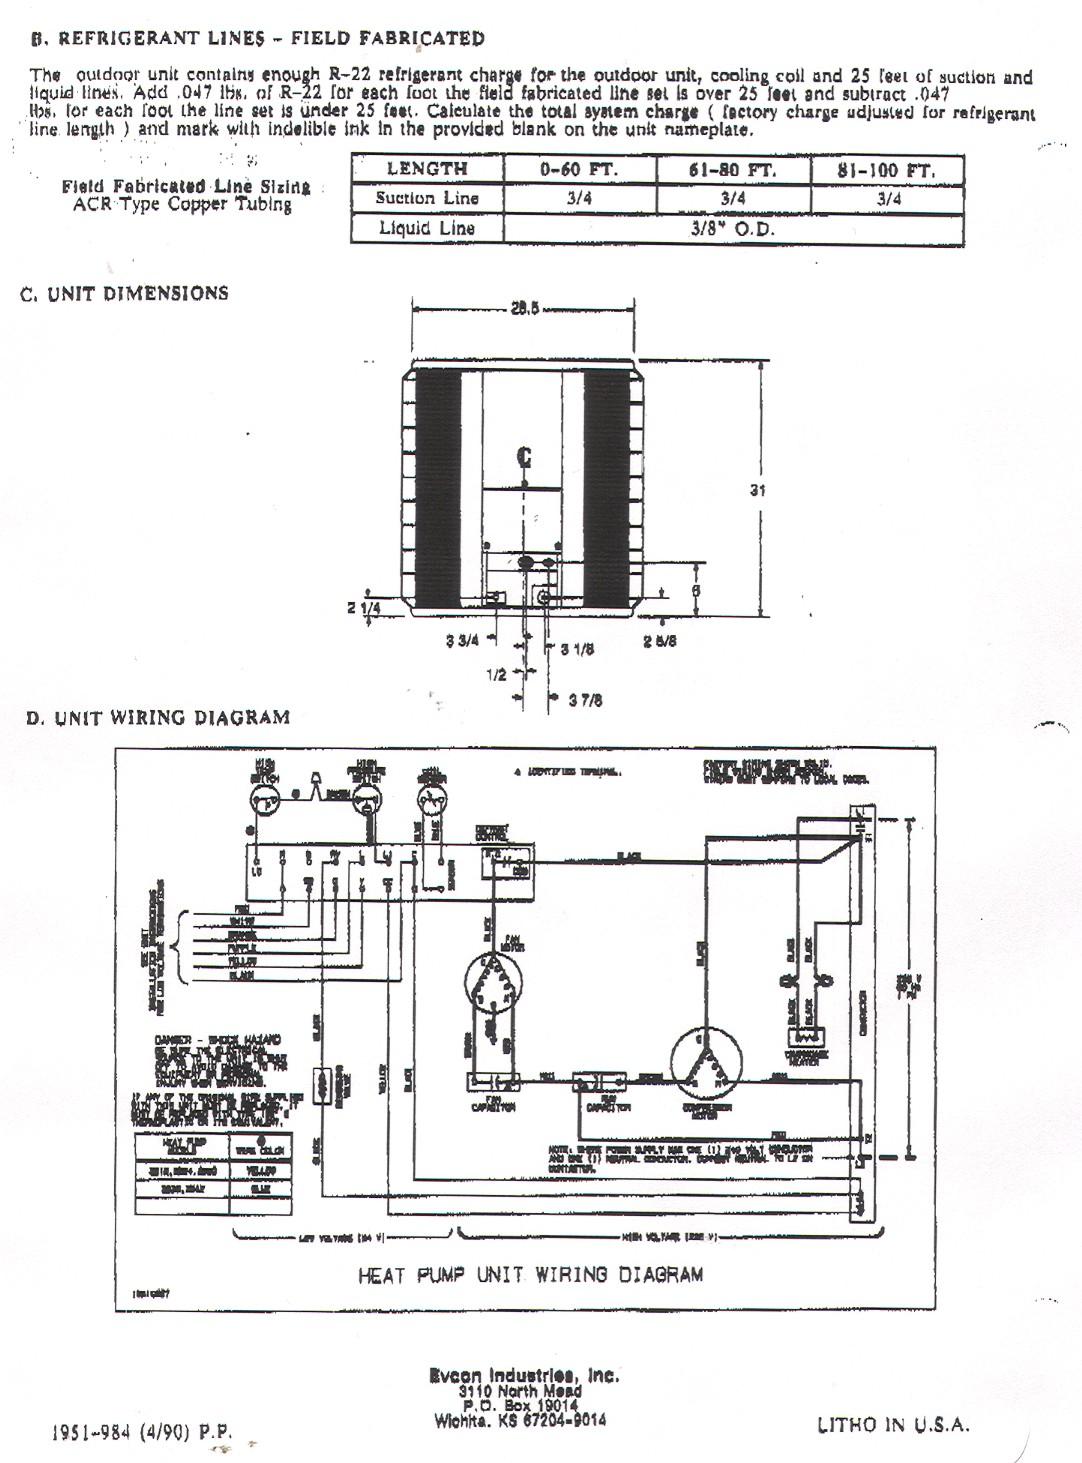 carrier heat pump wiring diagram thermostat Download-York Heat Pump Wiring Diagram 2-q